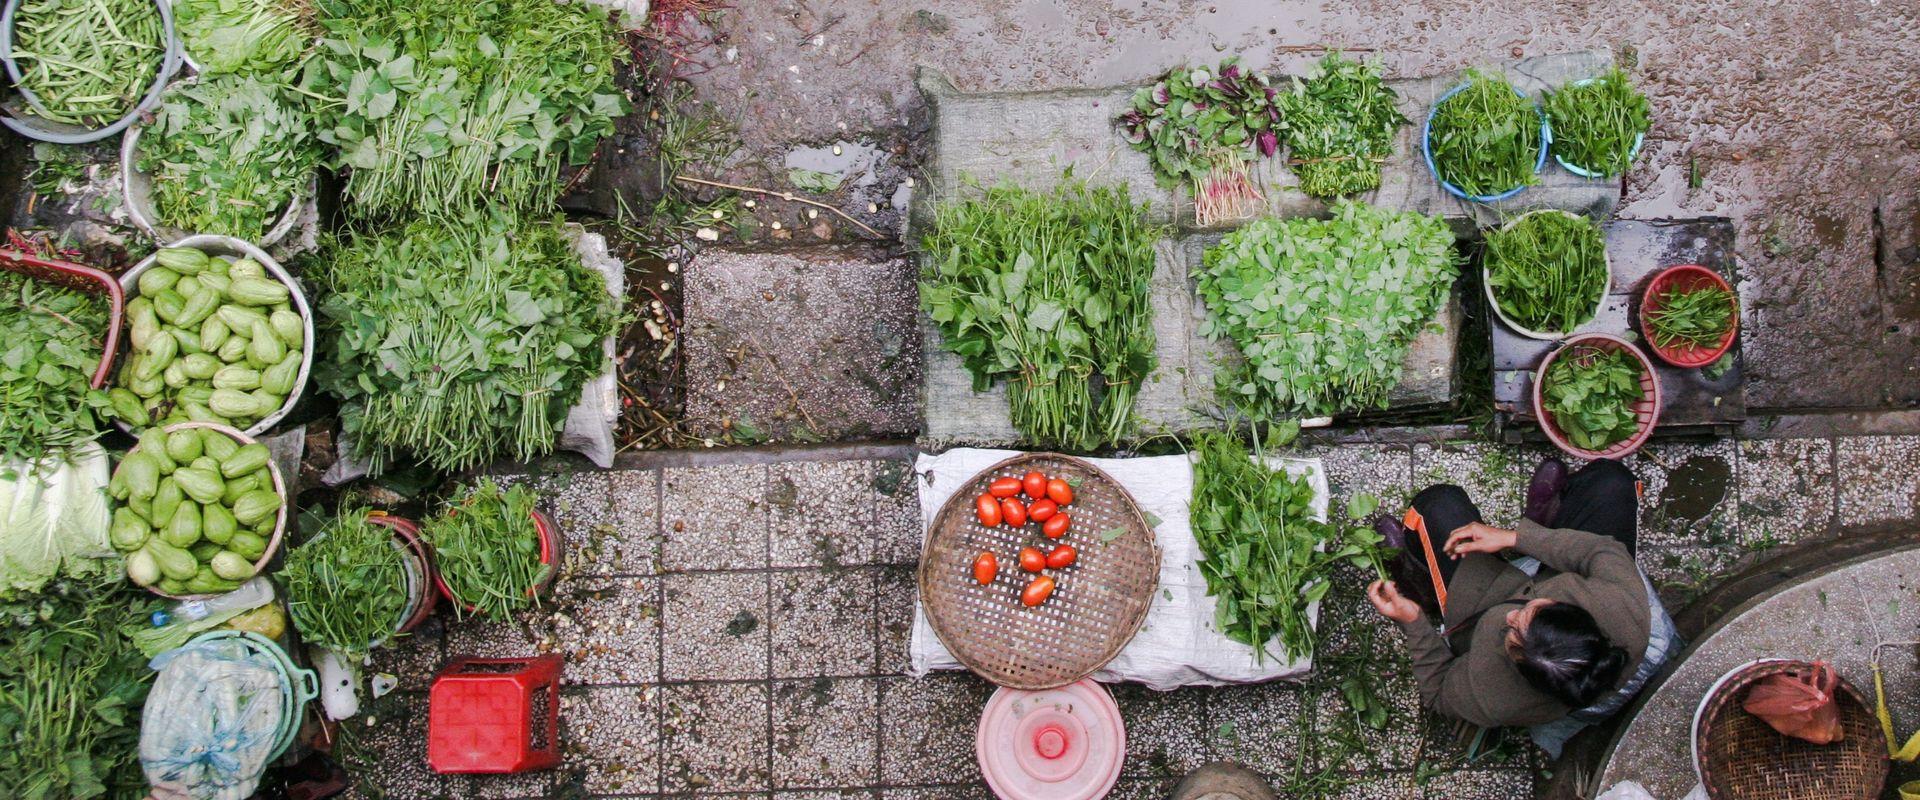 many green plants/vegetables